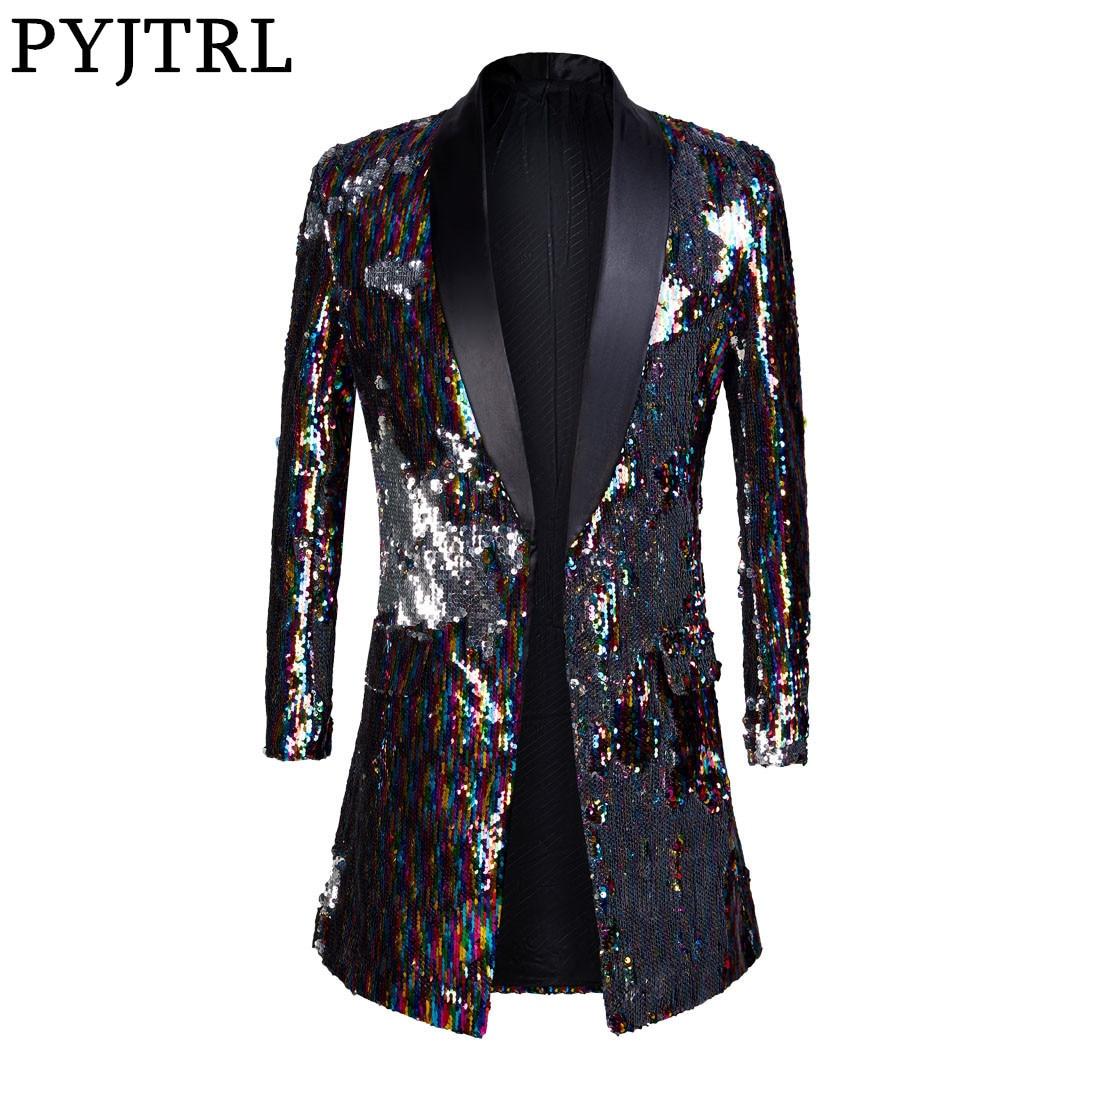 PYJTRL Male Fashion Shawl Lapel Double sided Colorful Sequins Long Suits Jacket Blazer Masculino Slim Fit Men DJ Singer Costume